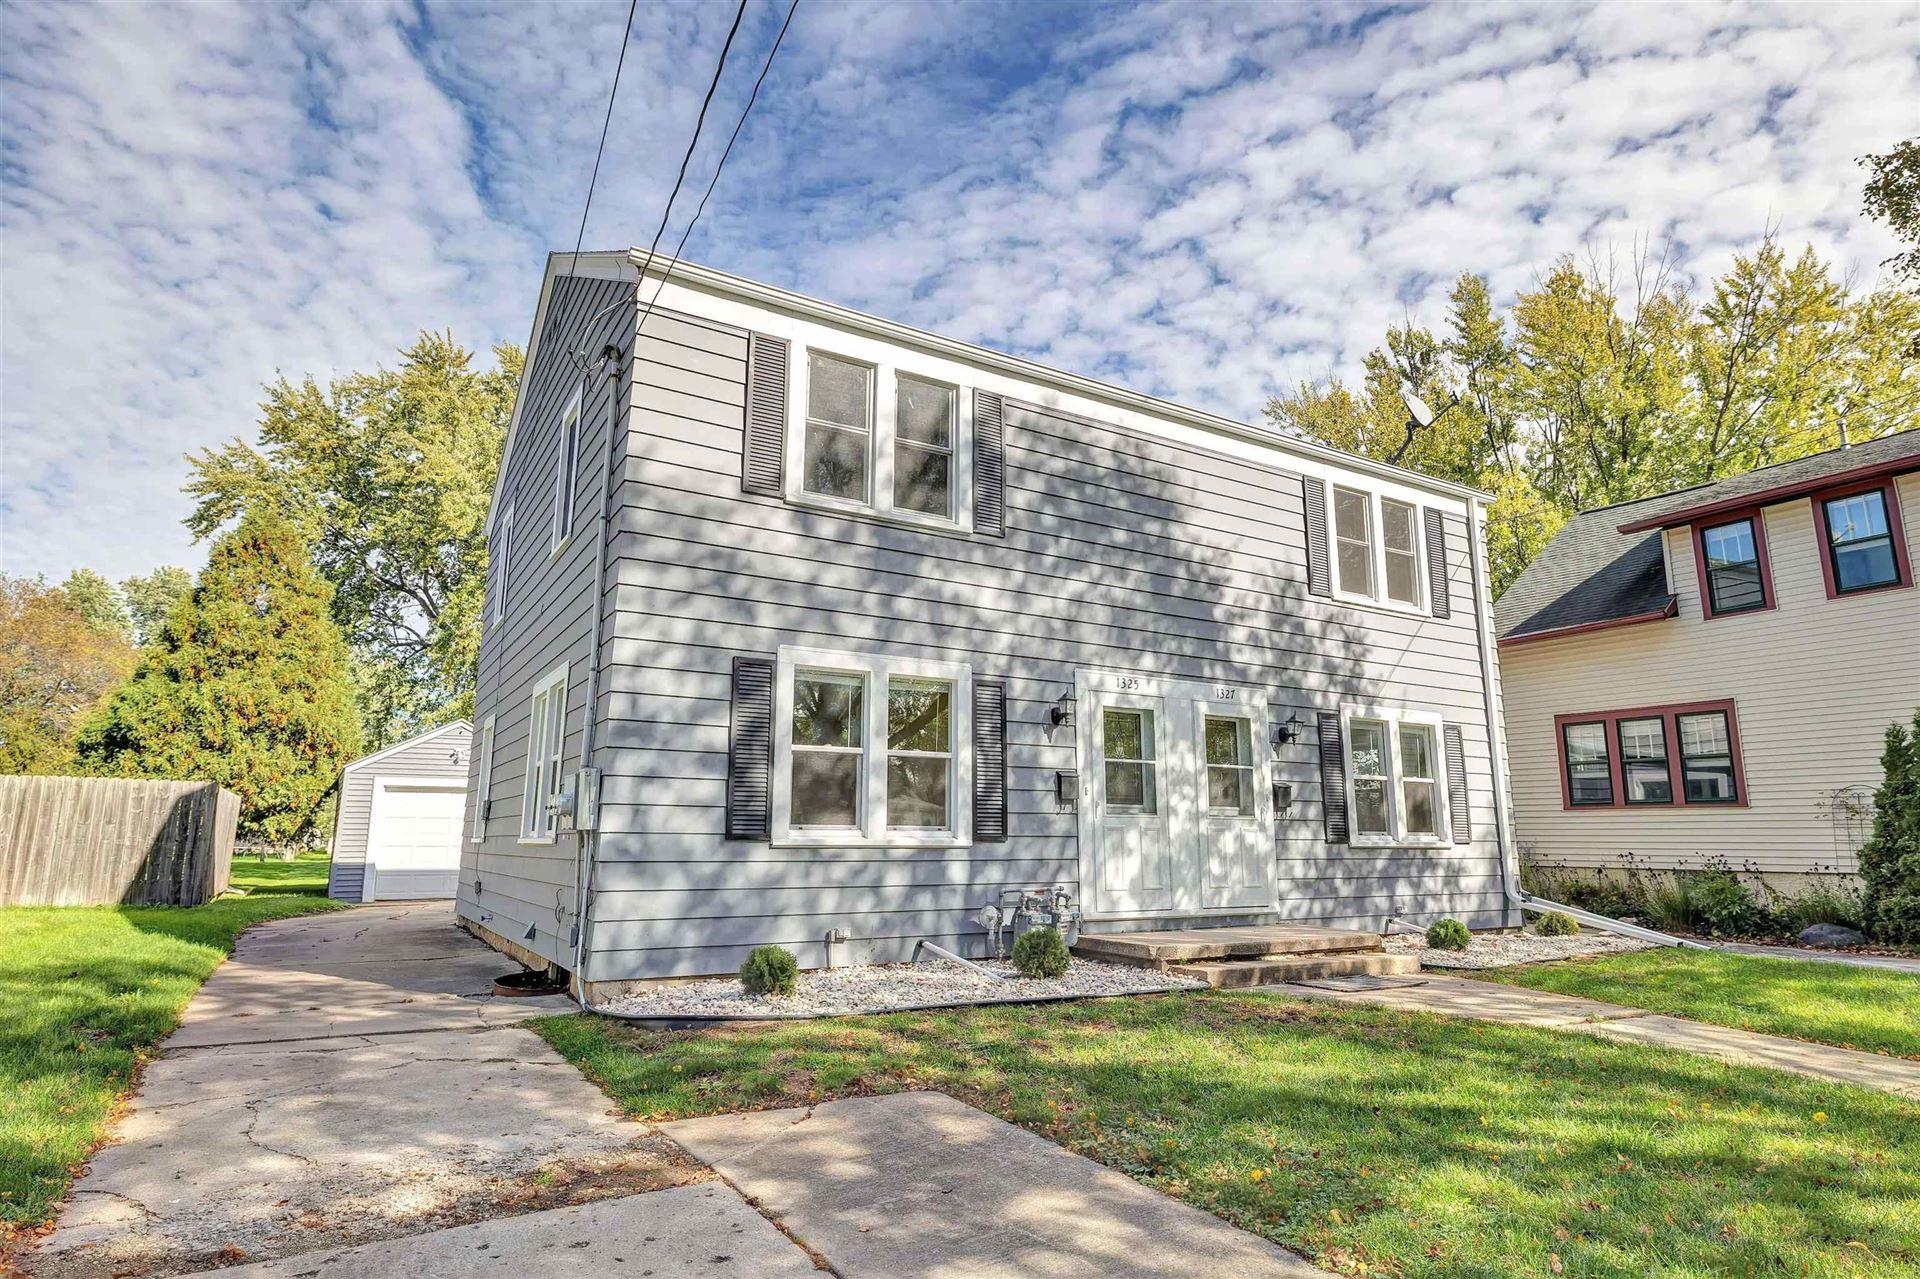 1325 ELIZA Street, Green Bay, WI 54301 - MLS#: 50249700